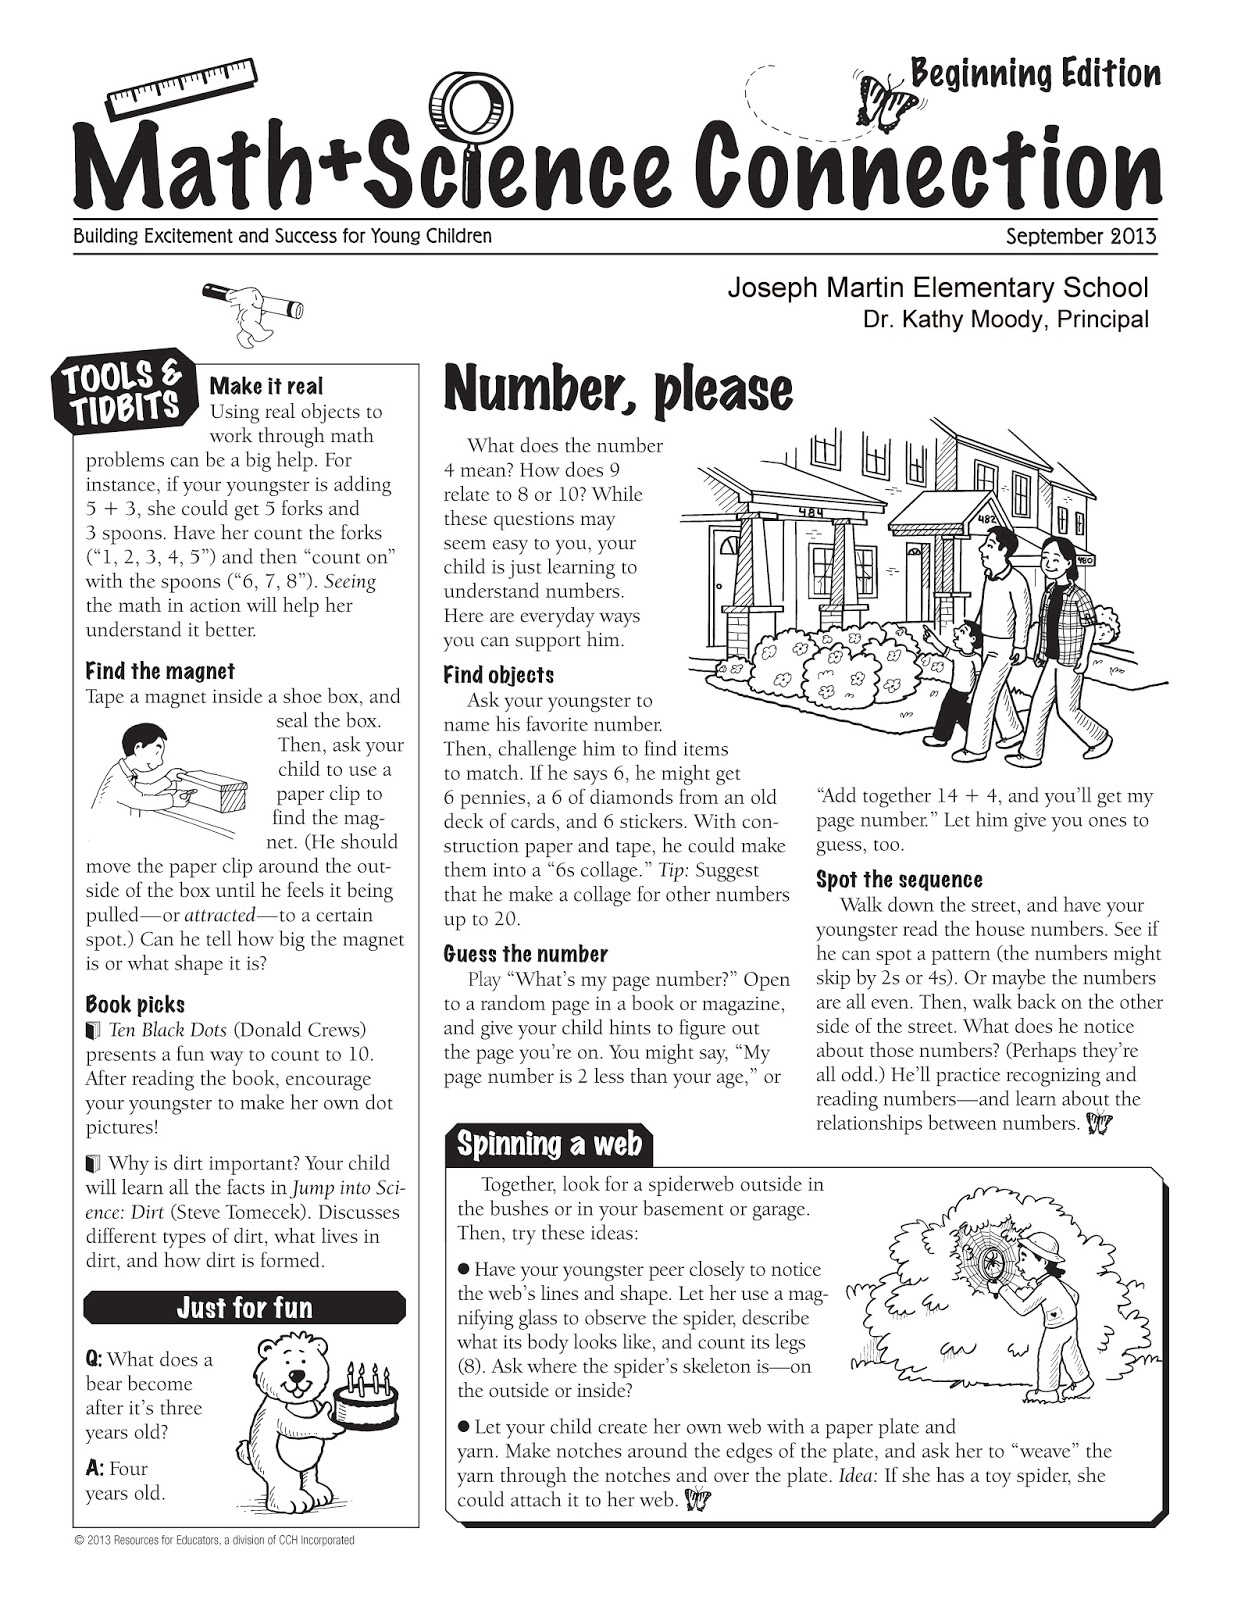 Joseph Martin Elementary School: September Math & Science